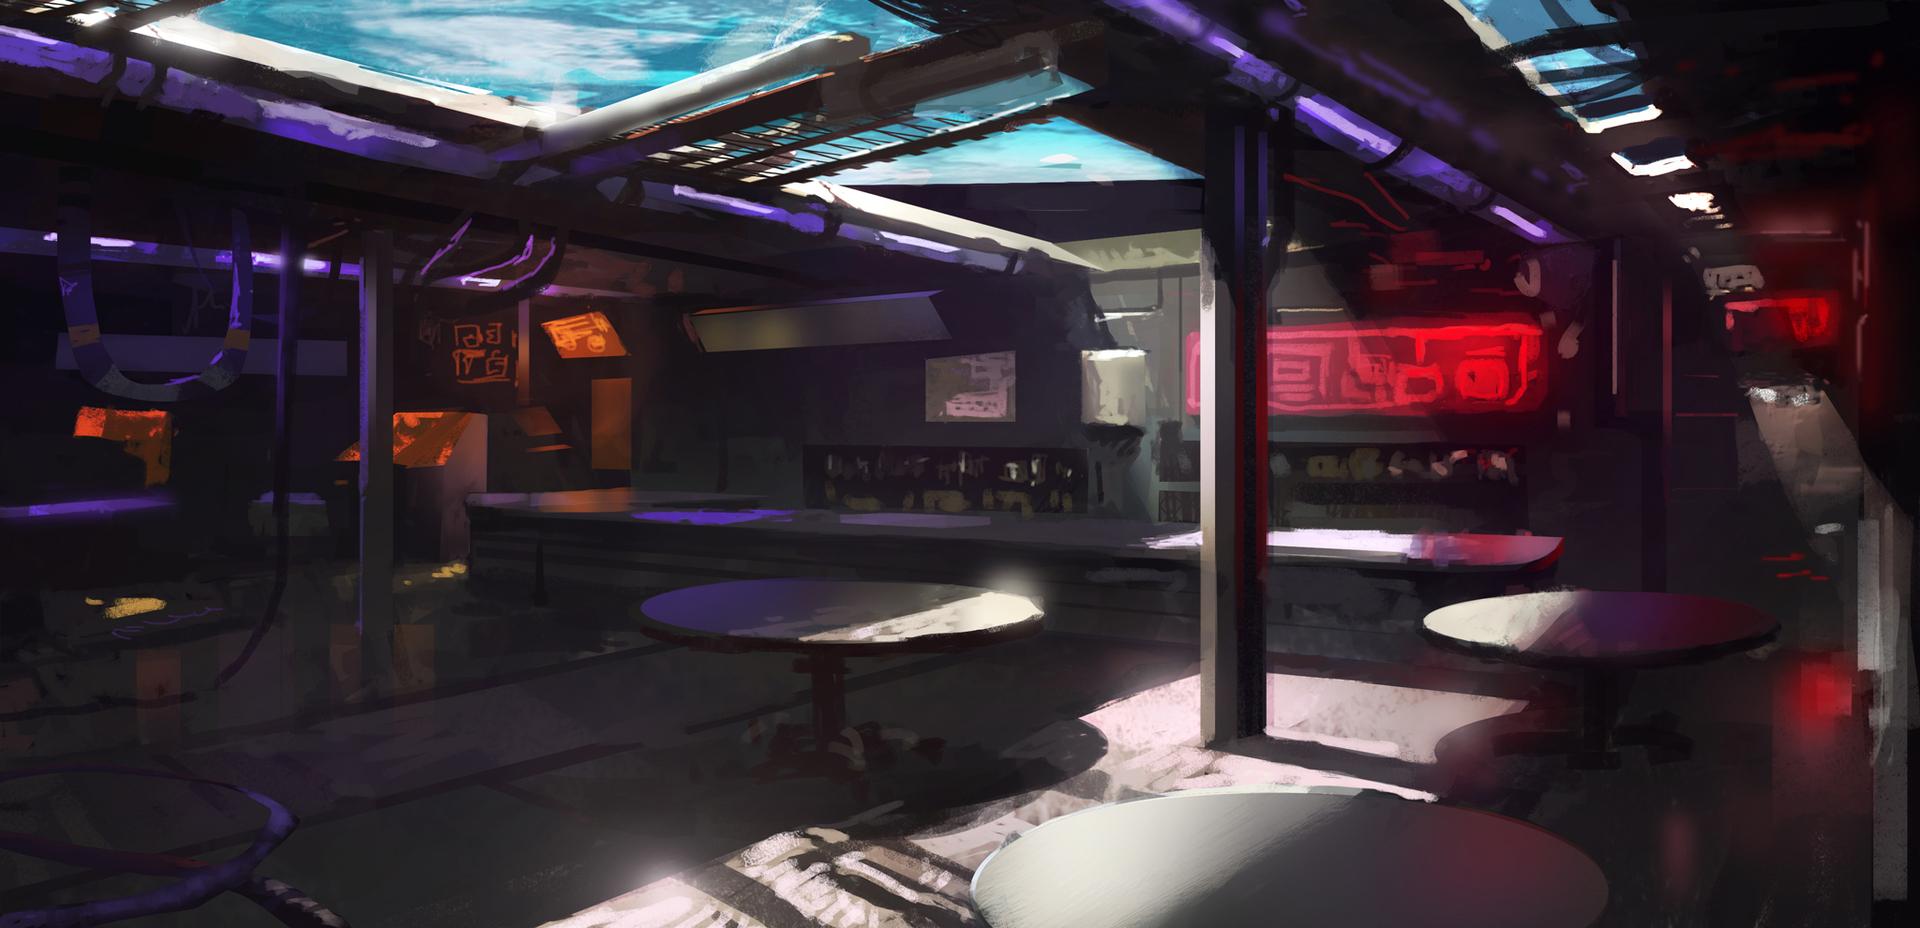 Spacebar 02 72